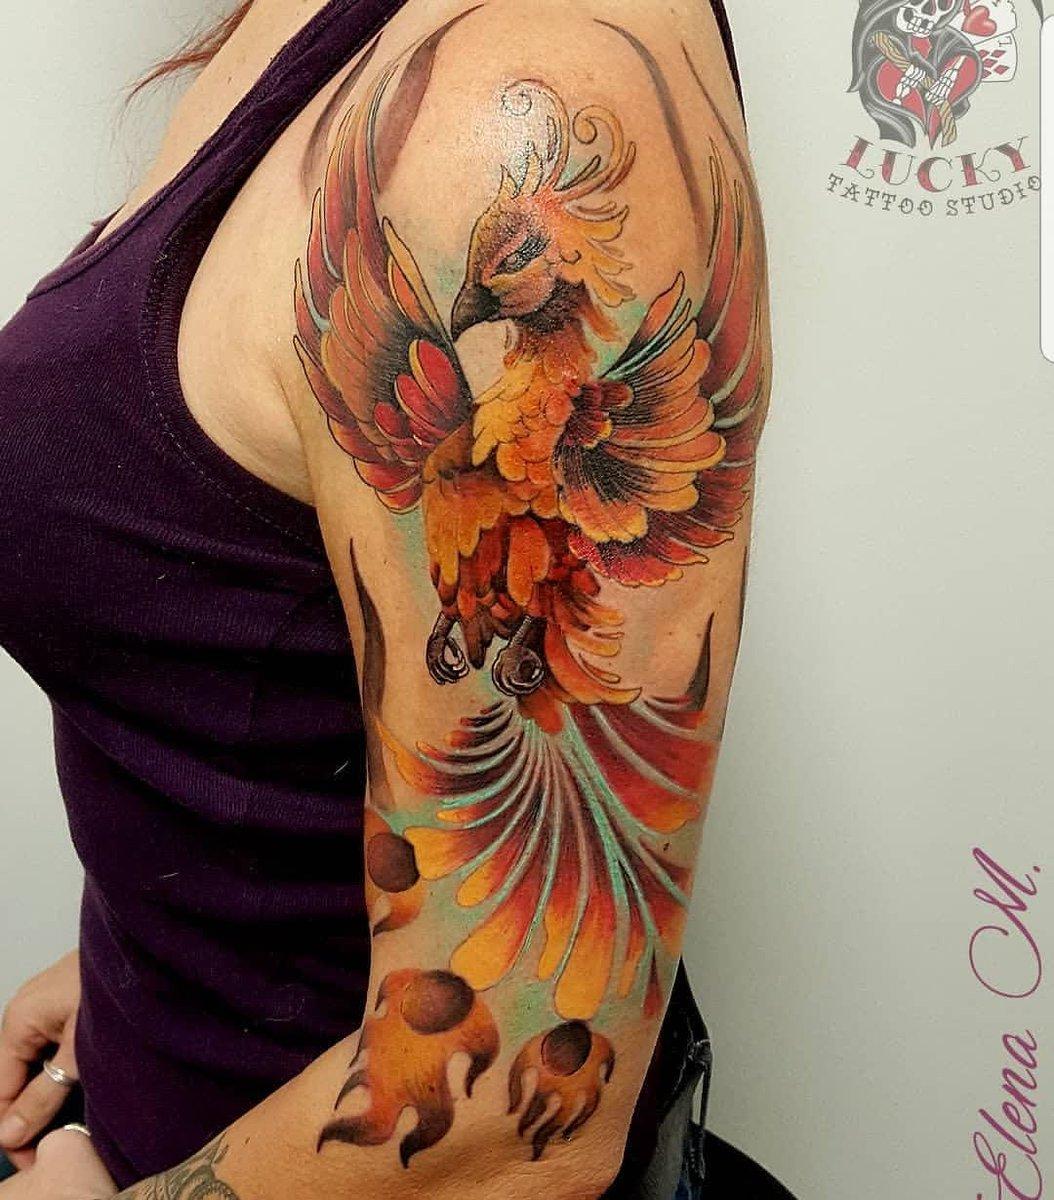 Ave Fénix hecho por Elena M en @lucky_tattoo_studio en Madrid, España    #tattoo #tattoos #tattooideas #tattooartist #tattooist #tattooed #tattoodesign #tattooart #tattoolover #tattooink #tattooers #tatuadoresespañoles #tatuadora #fenixtattoo #avefenixtattoo #phoenixtattoo